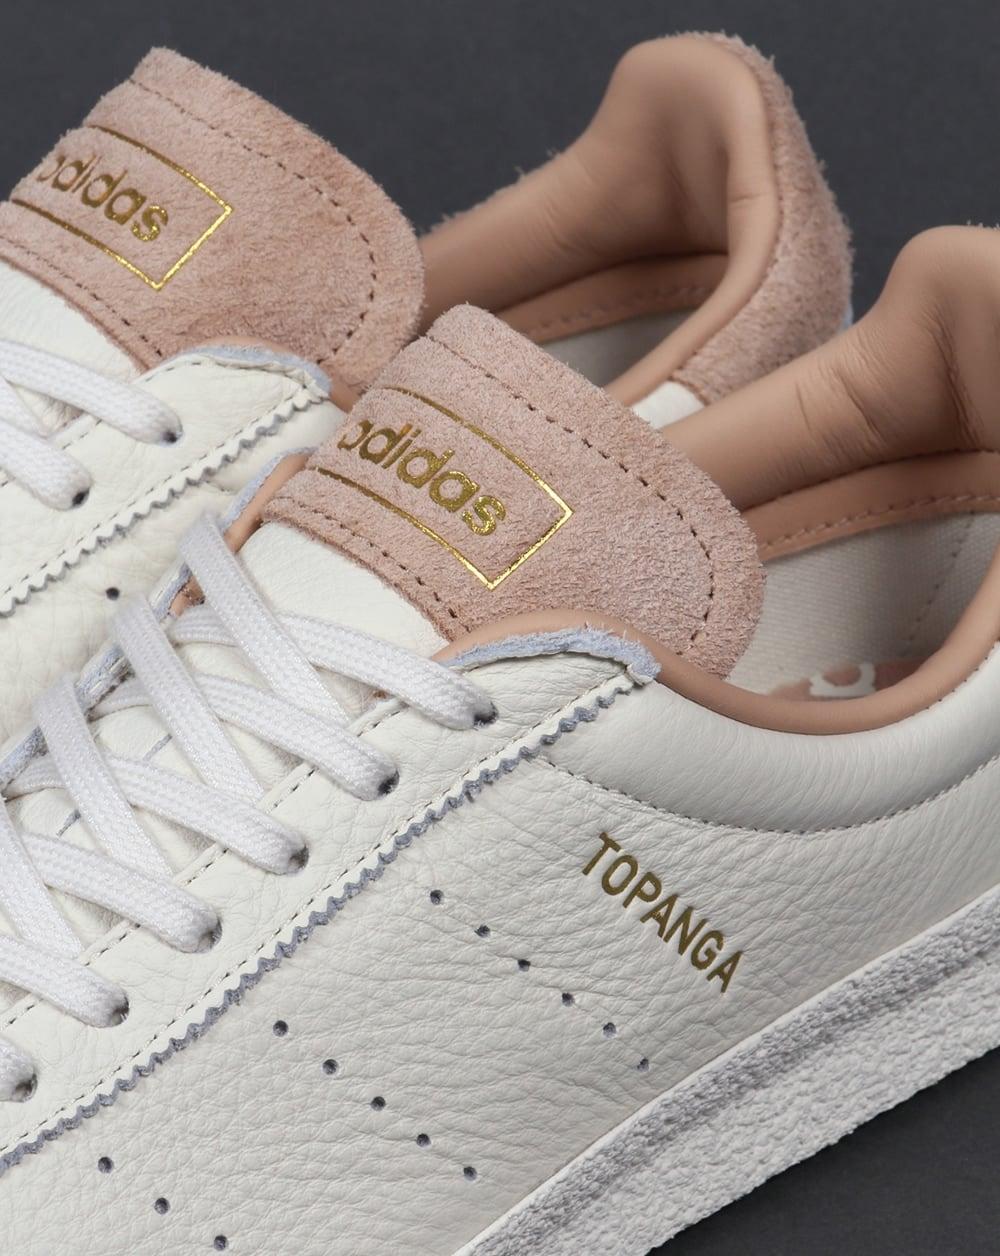 Adidas topanga formatori biancastro, originali, pulito 80 casual